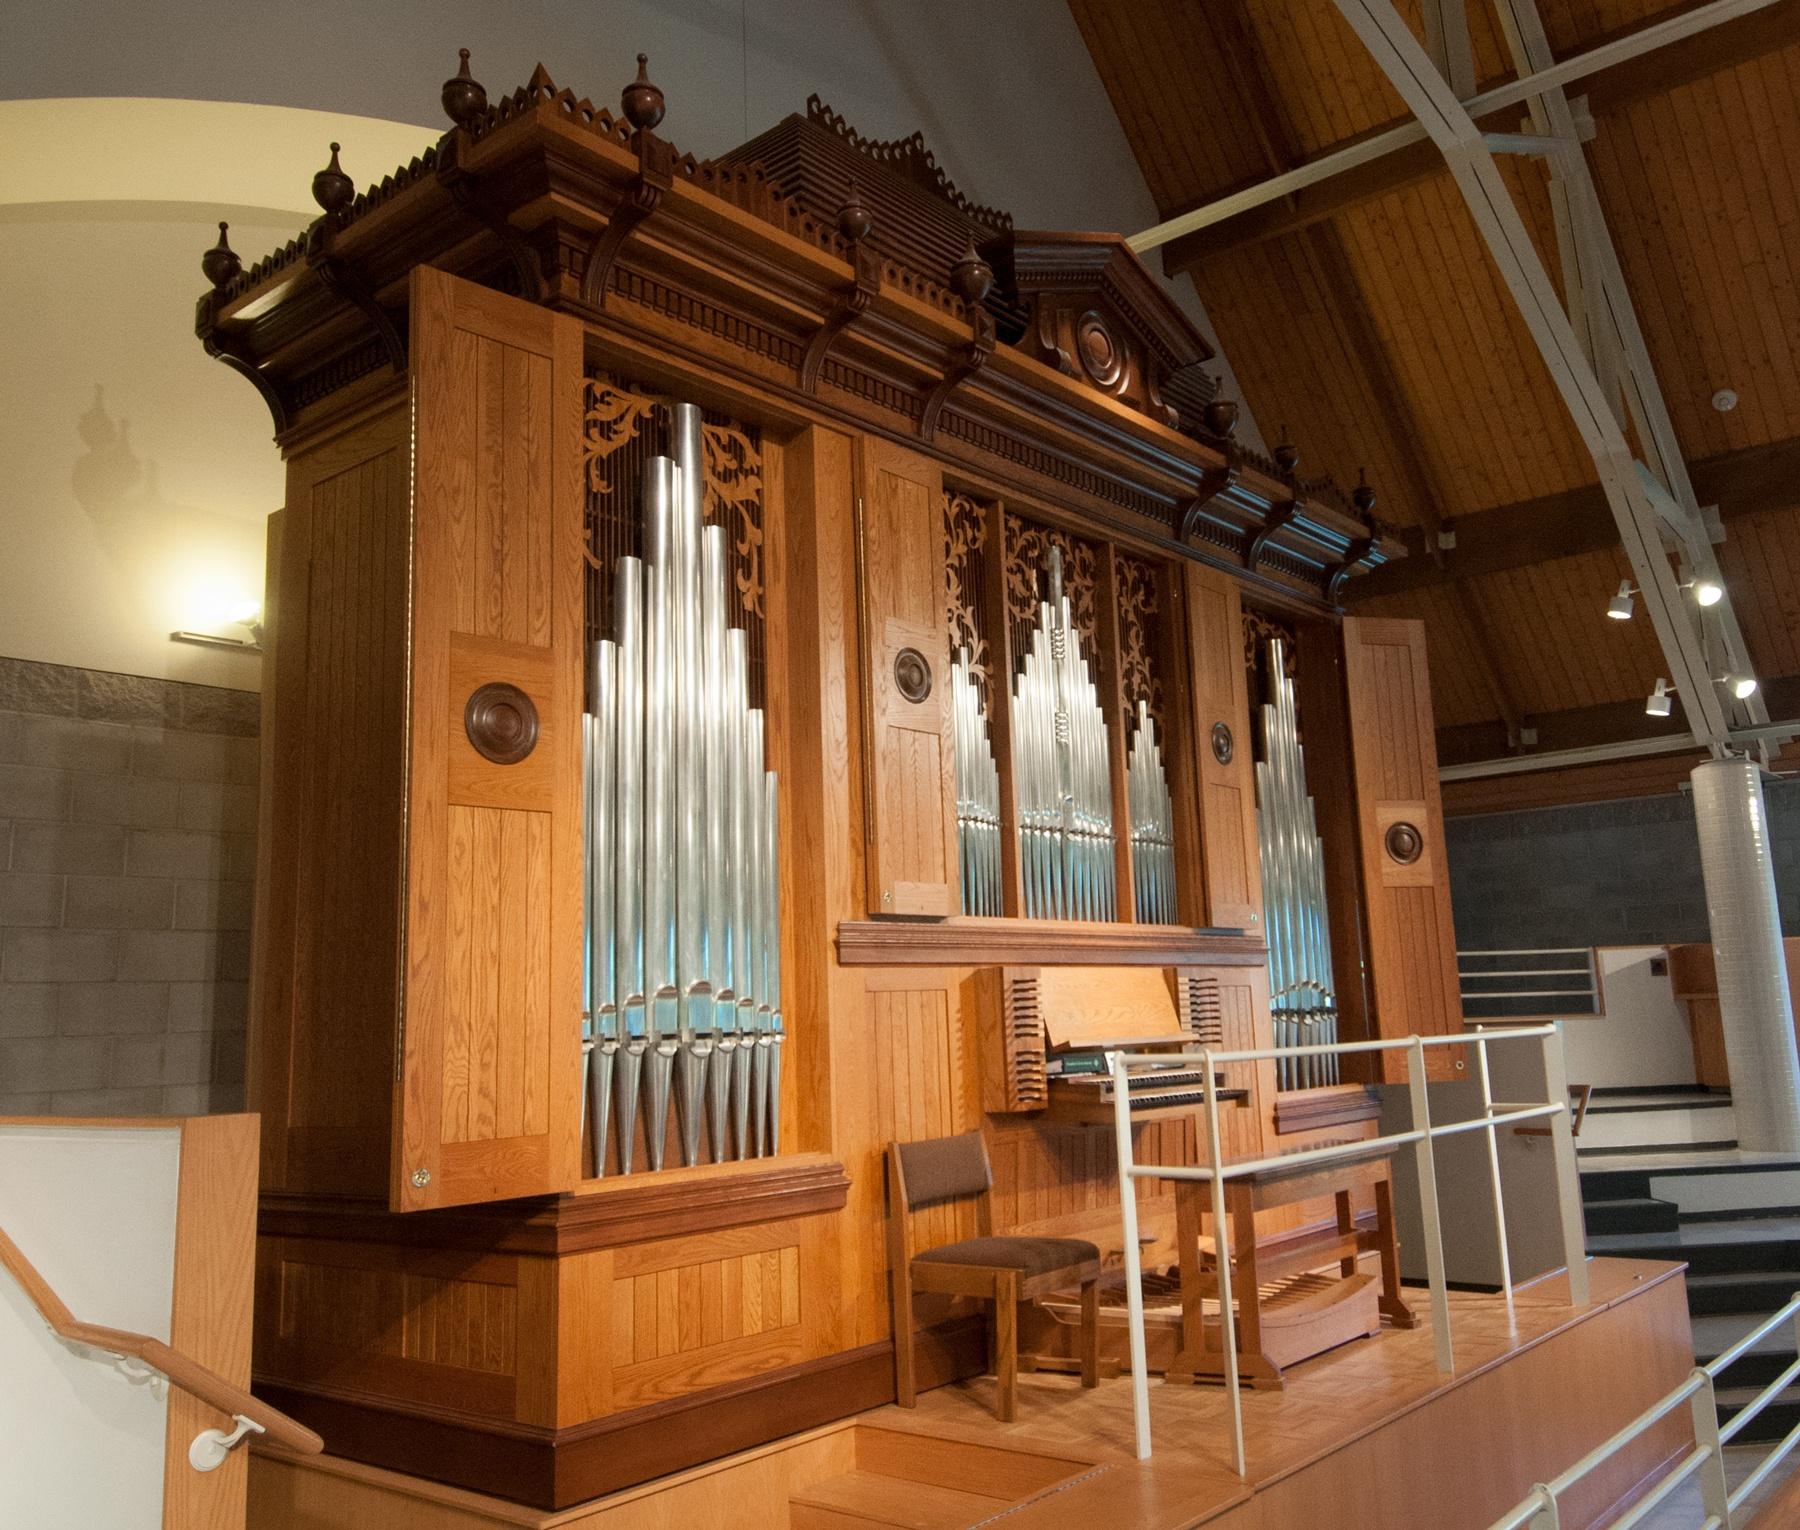 Dobson organ Trinity Chapel